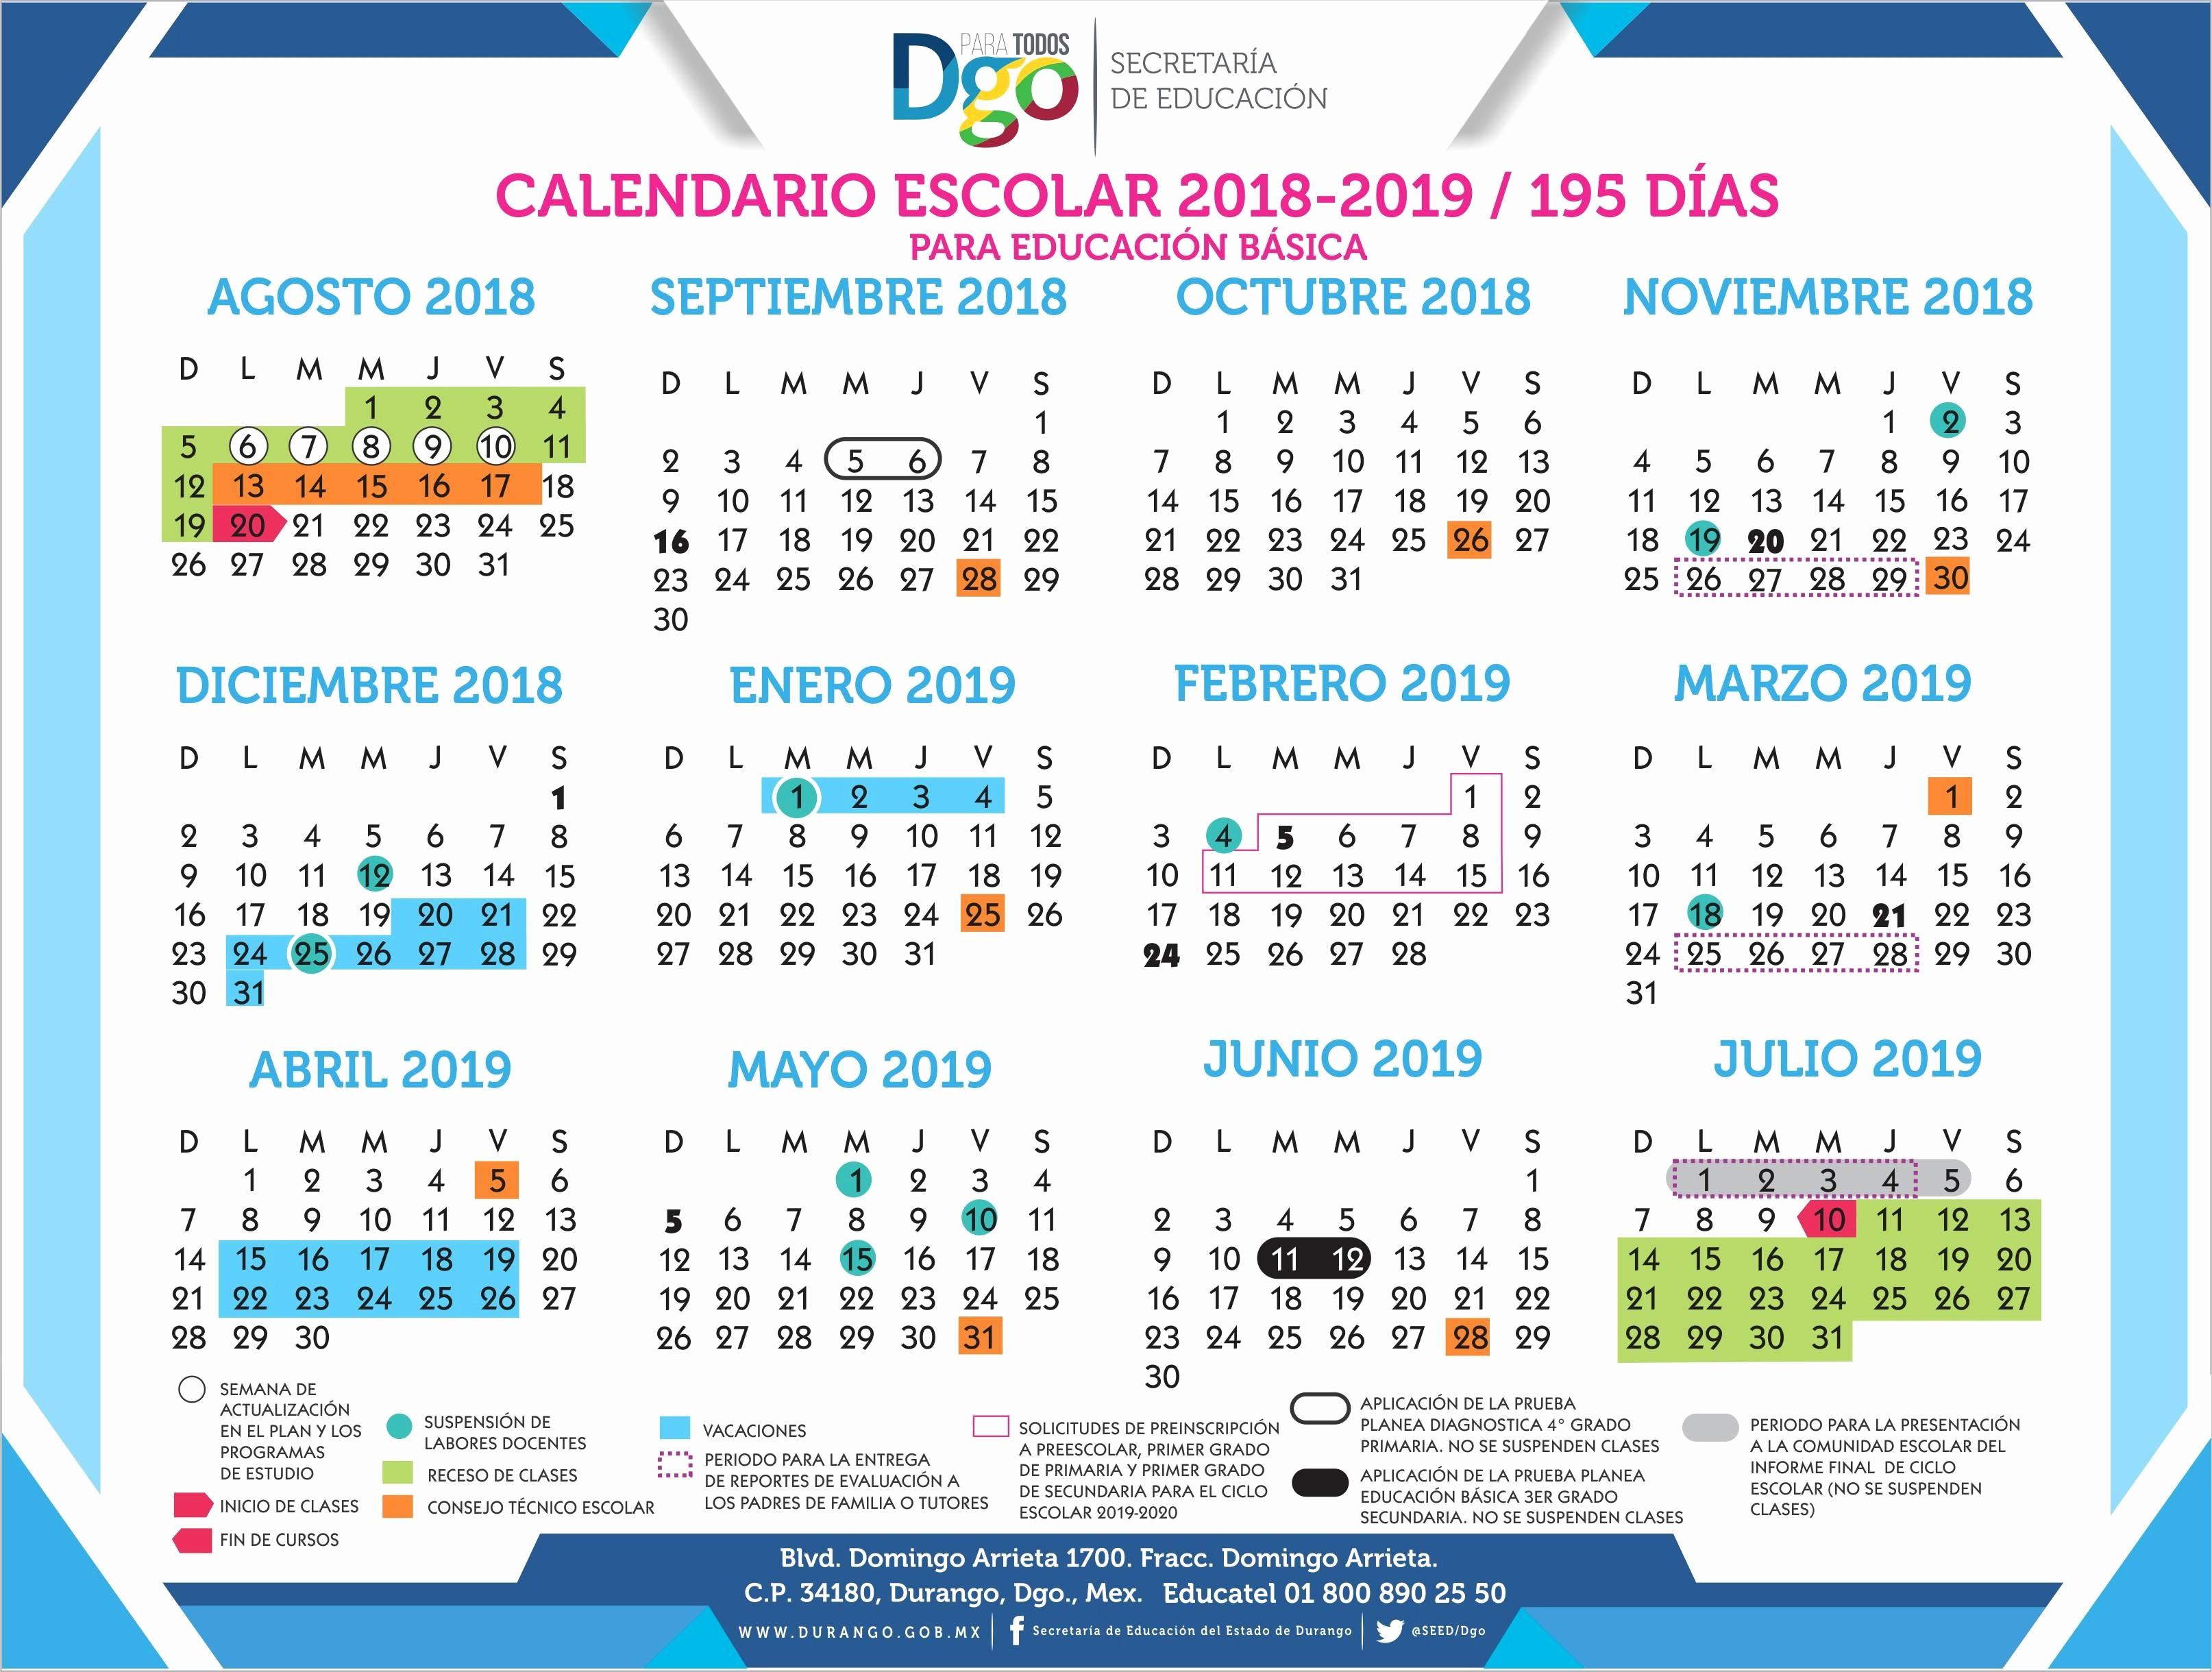 calendario escolar ferias 2019 calendario escolar ferias 2019 calendario escolar 2018 2019 secretaria de educacion